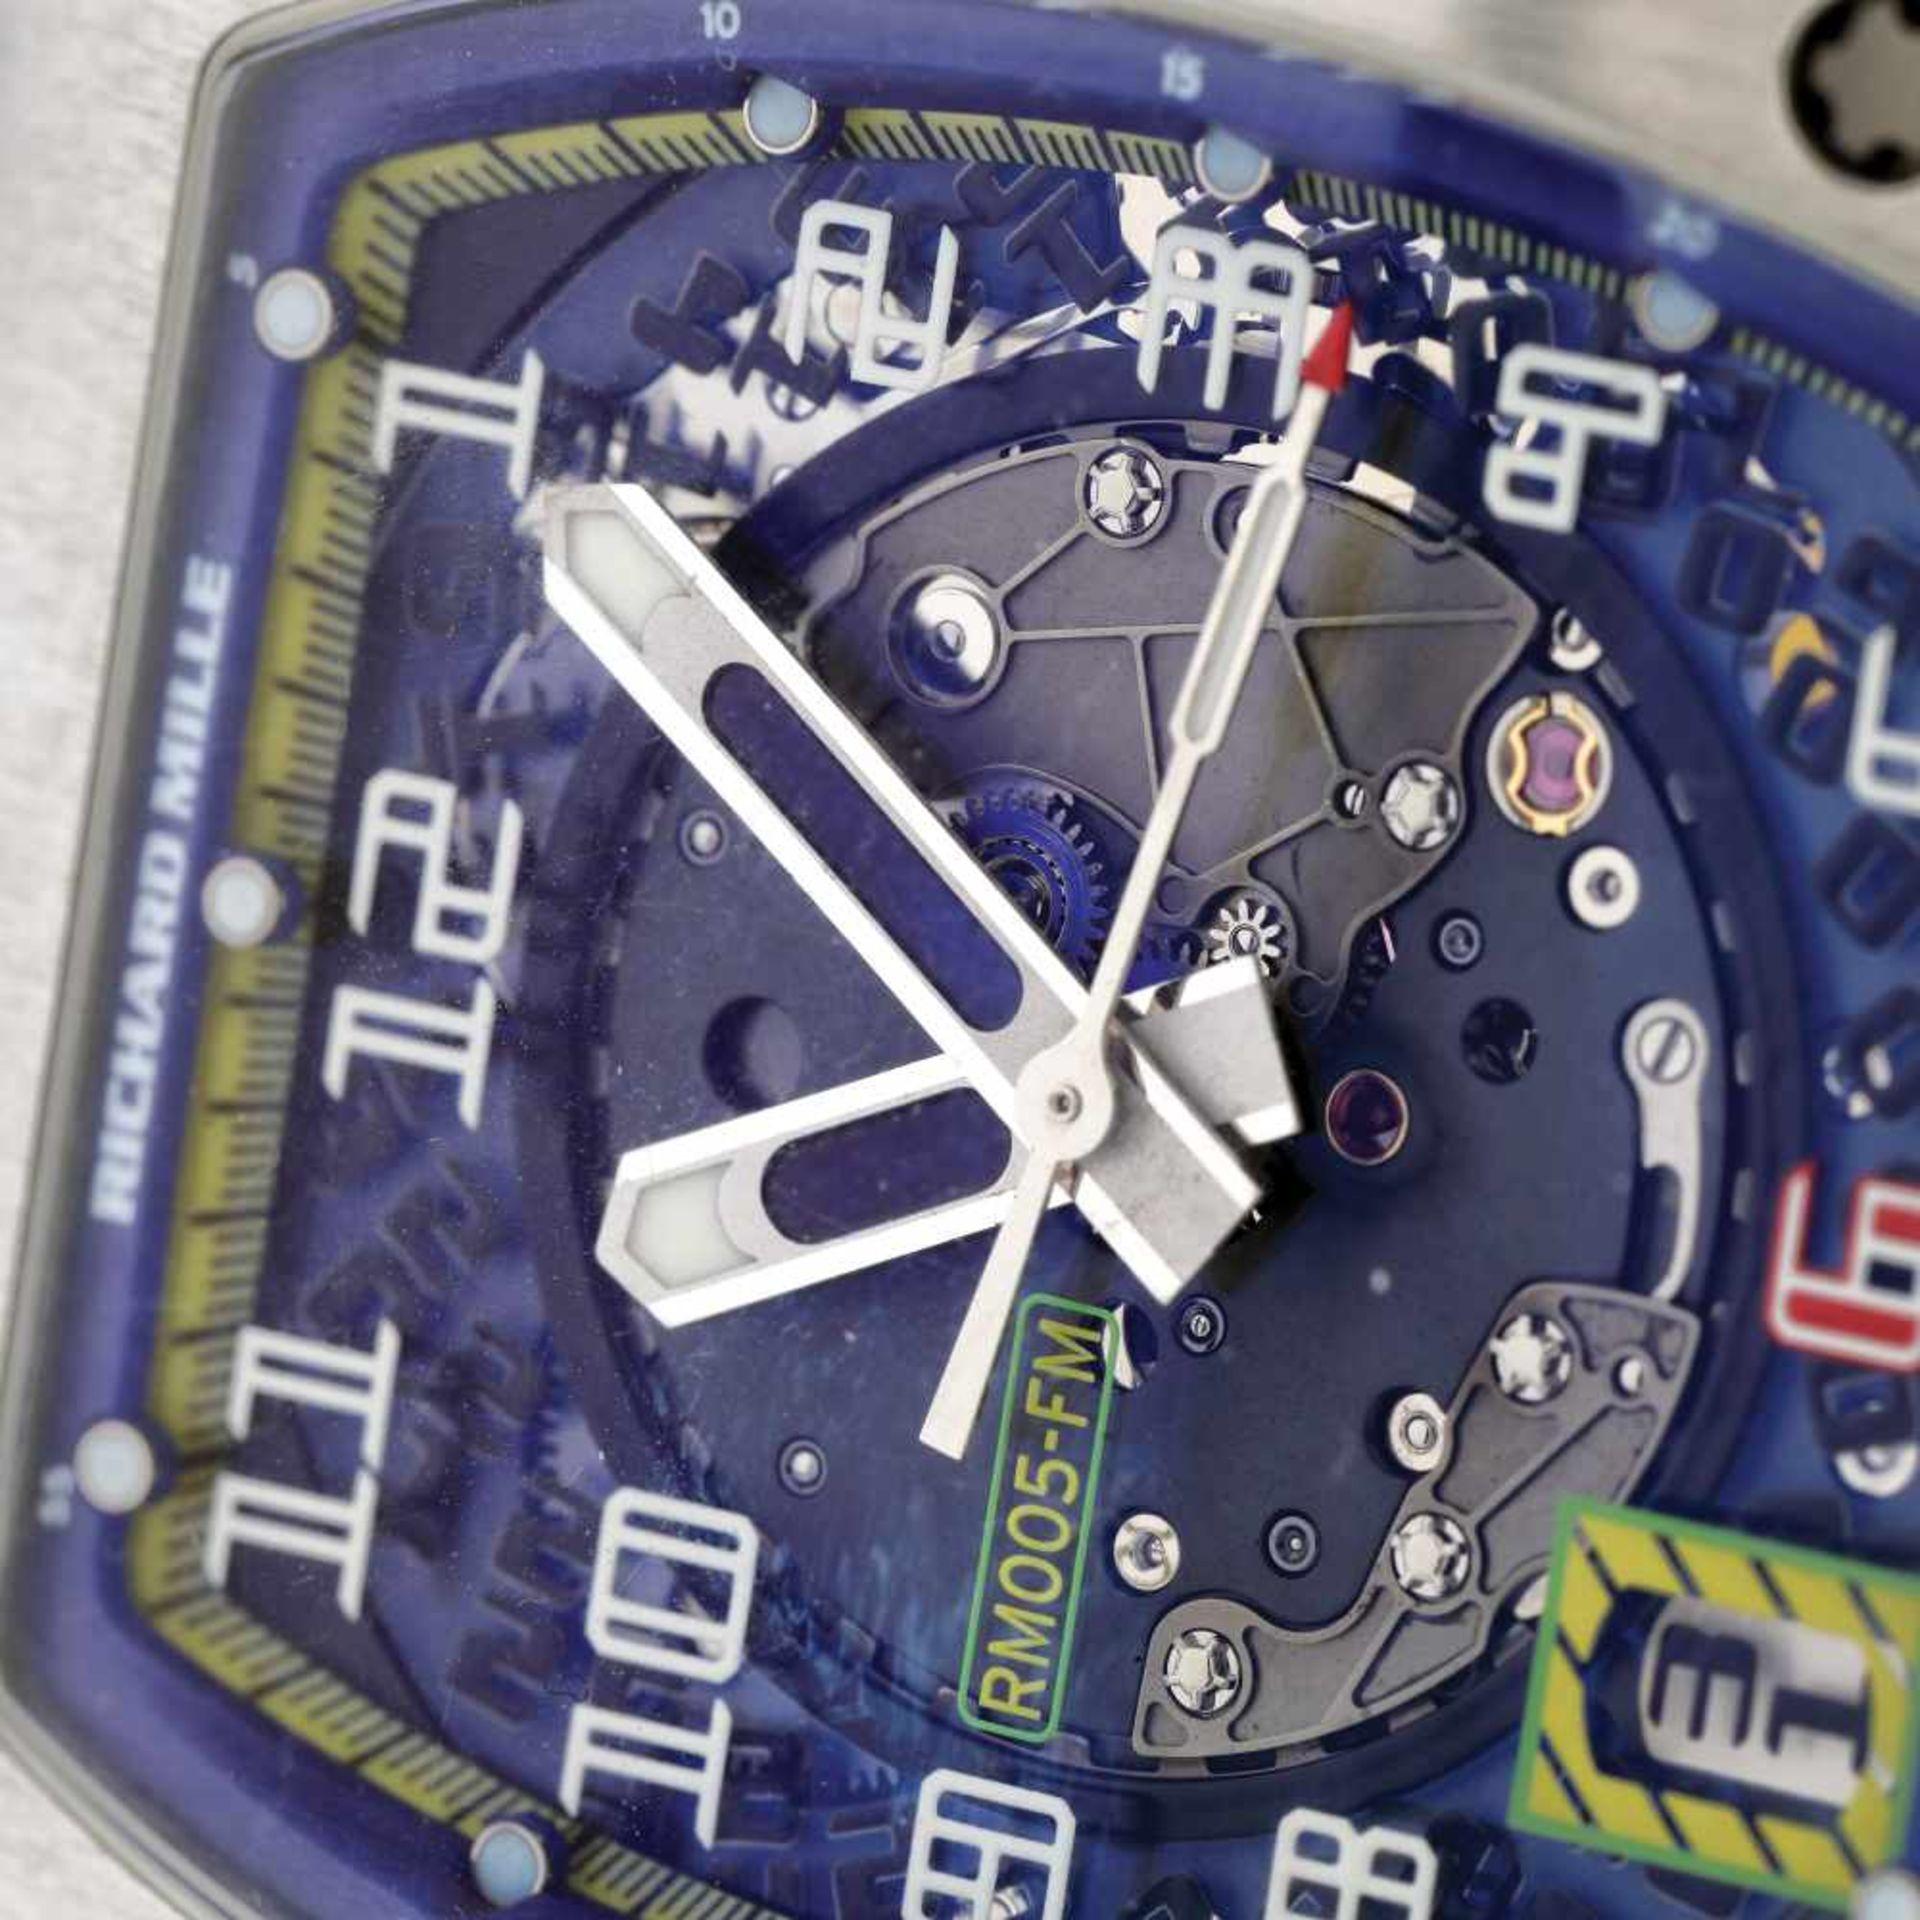 Richard Mille RM005 Felipe Massa AG TI wristwatch, platinum, men, limited edition 3/40 - Bild 2 aus 4